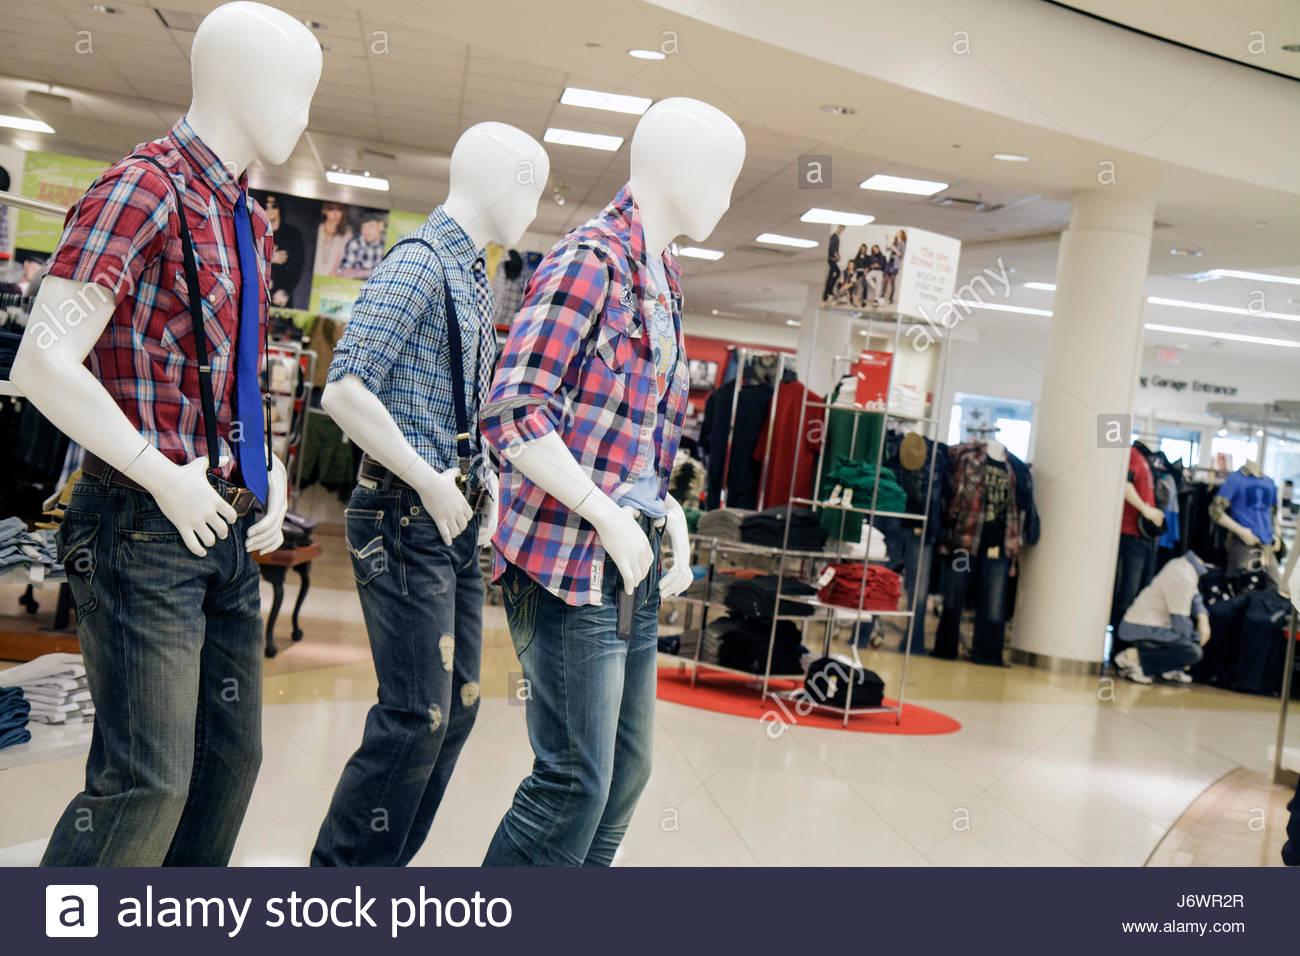 b63d140f2e64 Miami Florida Aventura Aventura Mall Macy's department store shopping  retail display for sale men's clothing fashion